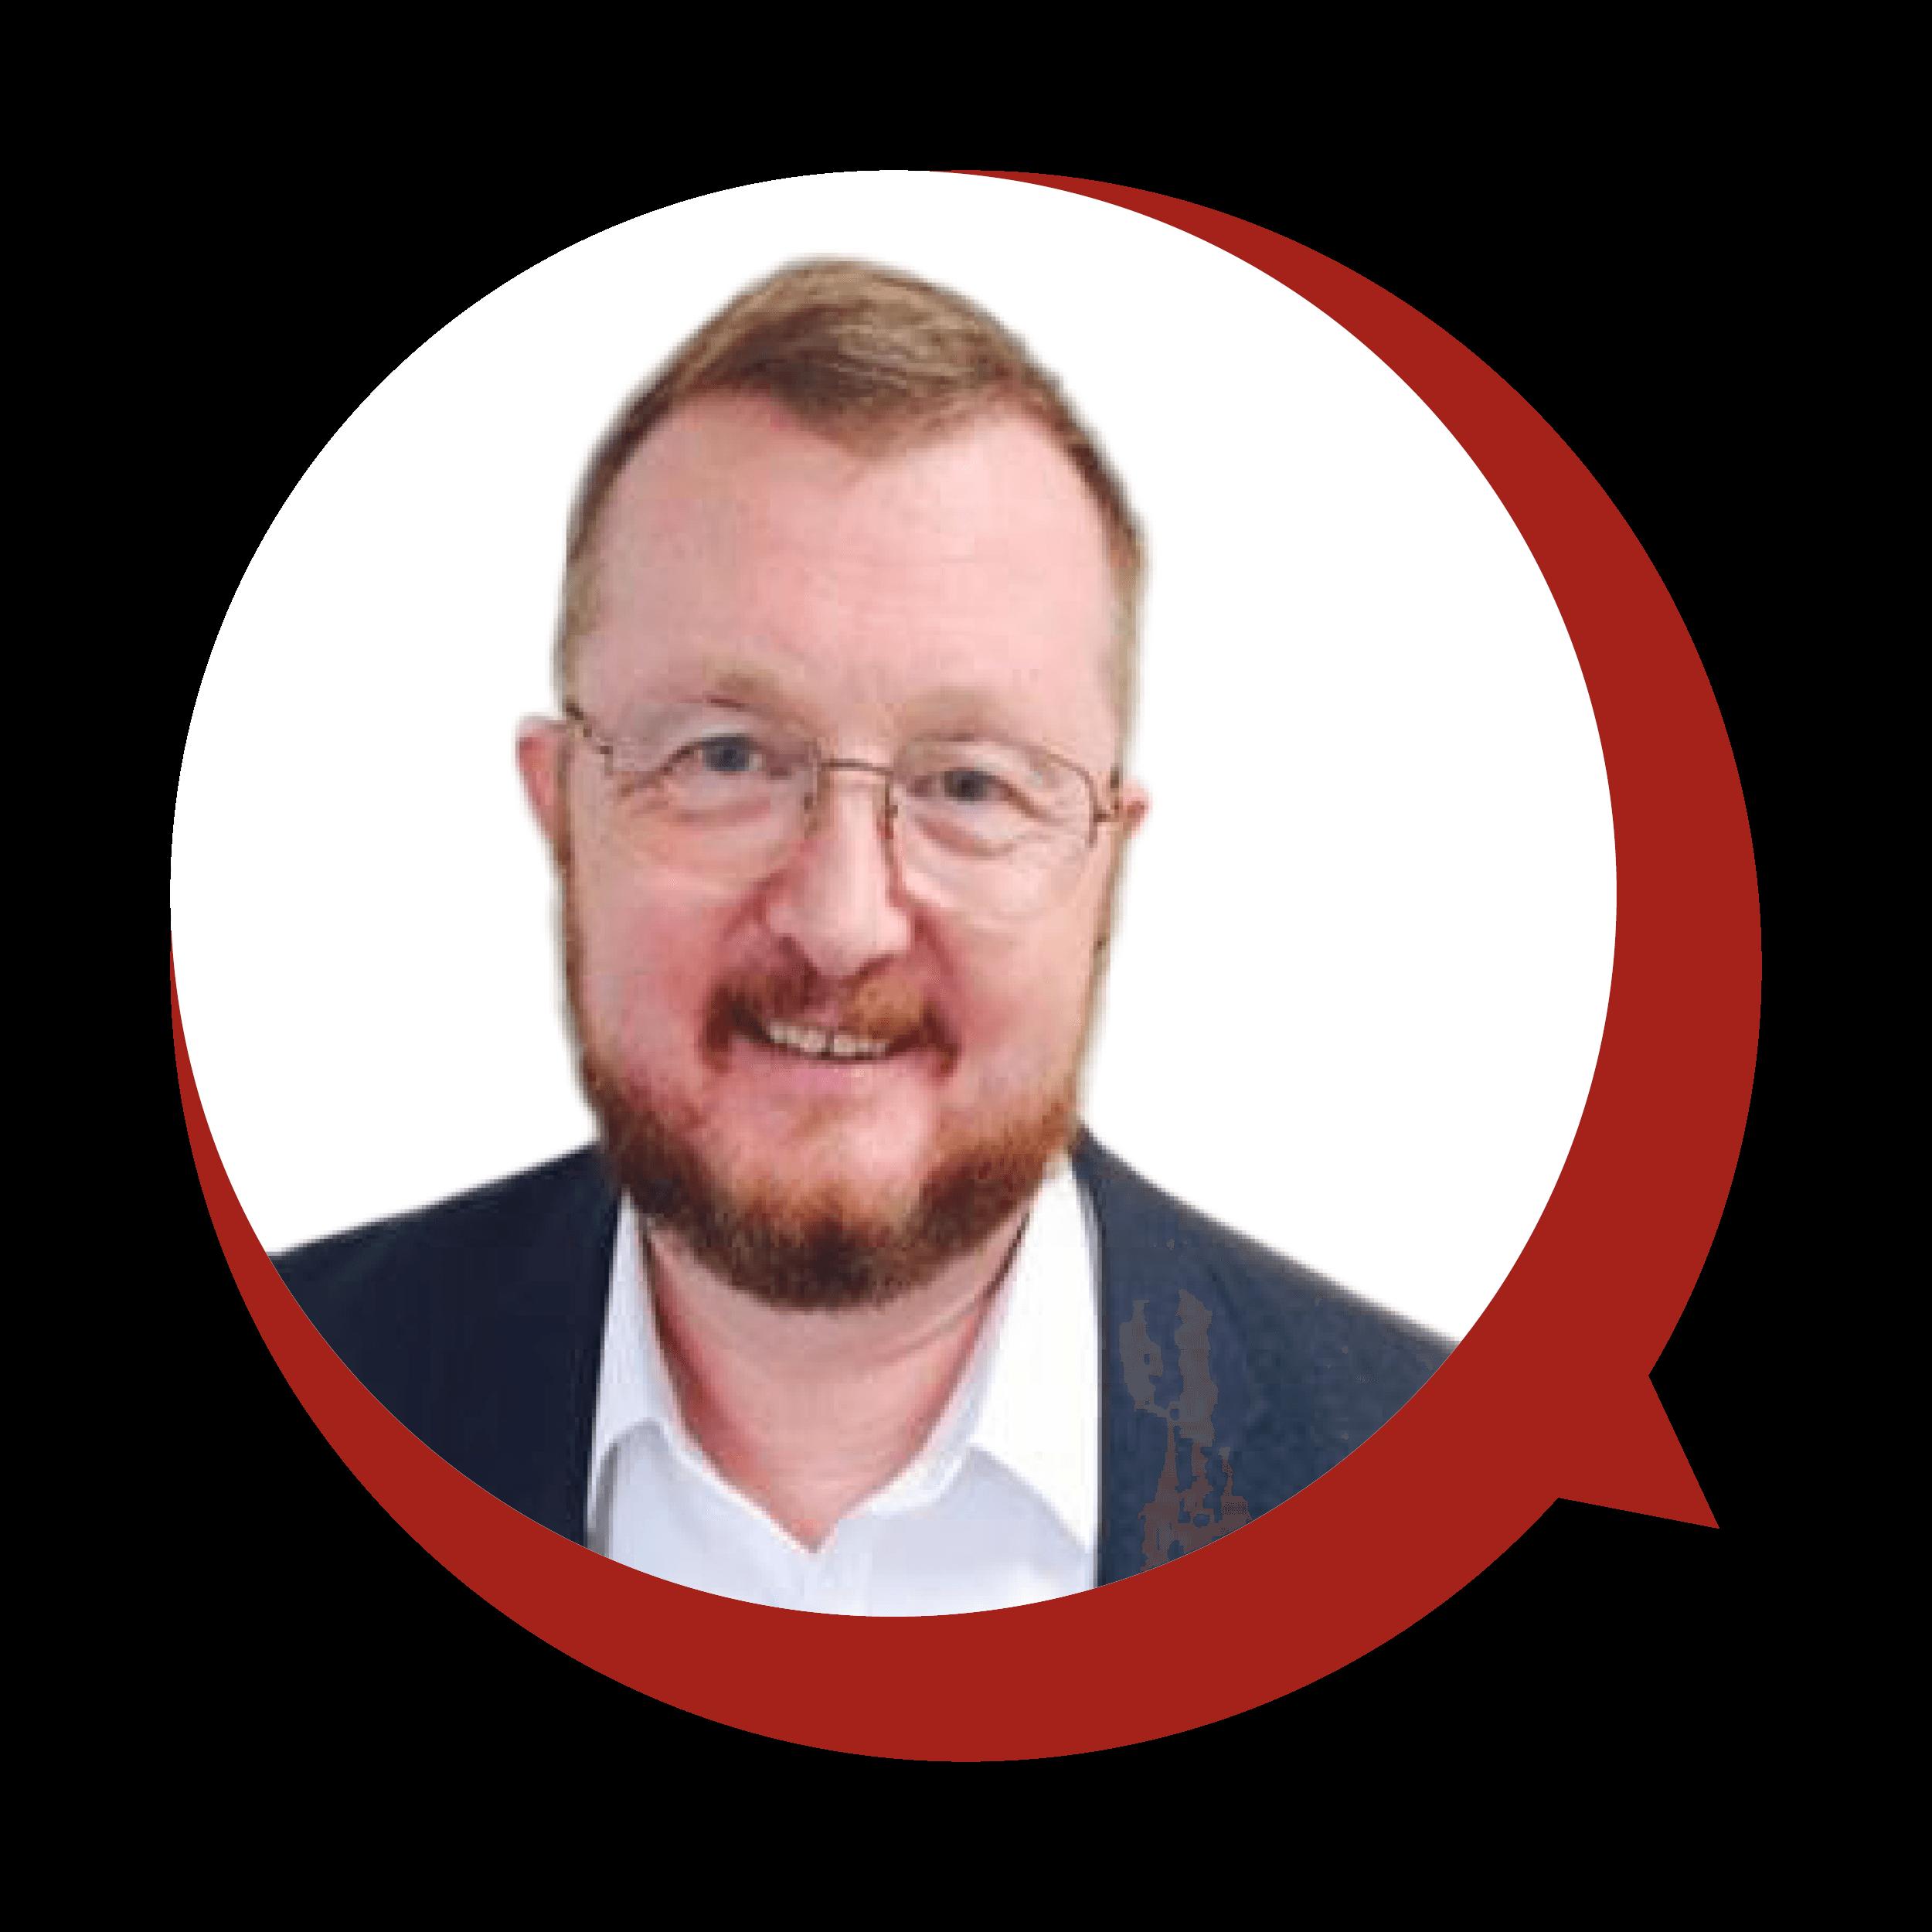 Steven Shoulder International Business Transformation Expert